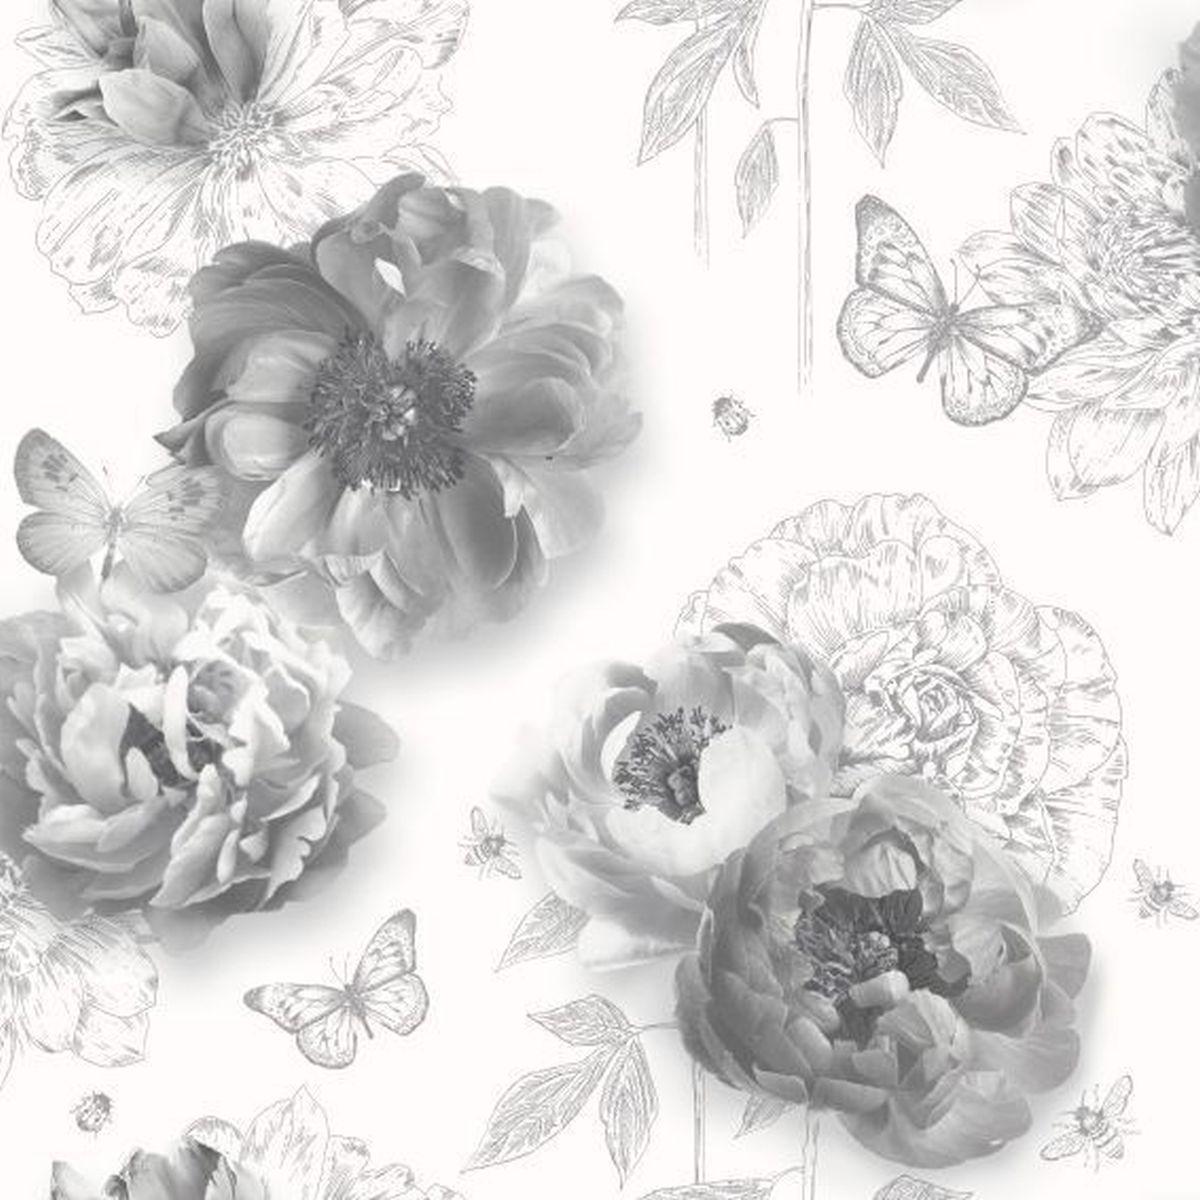 Best of Arthouse Vliestapete Qualitätsvolle Tapete 259201 Grau Blumentapete